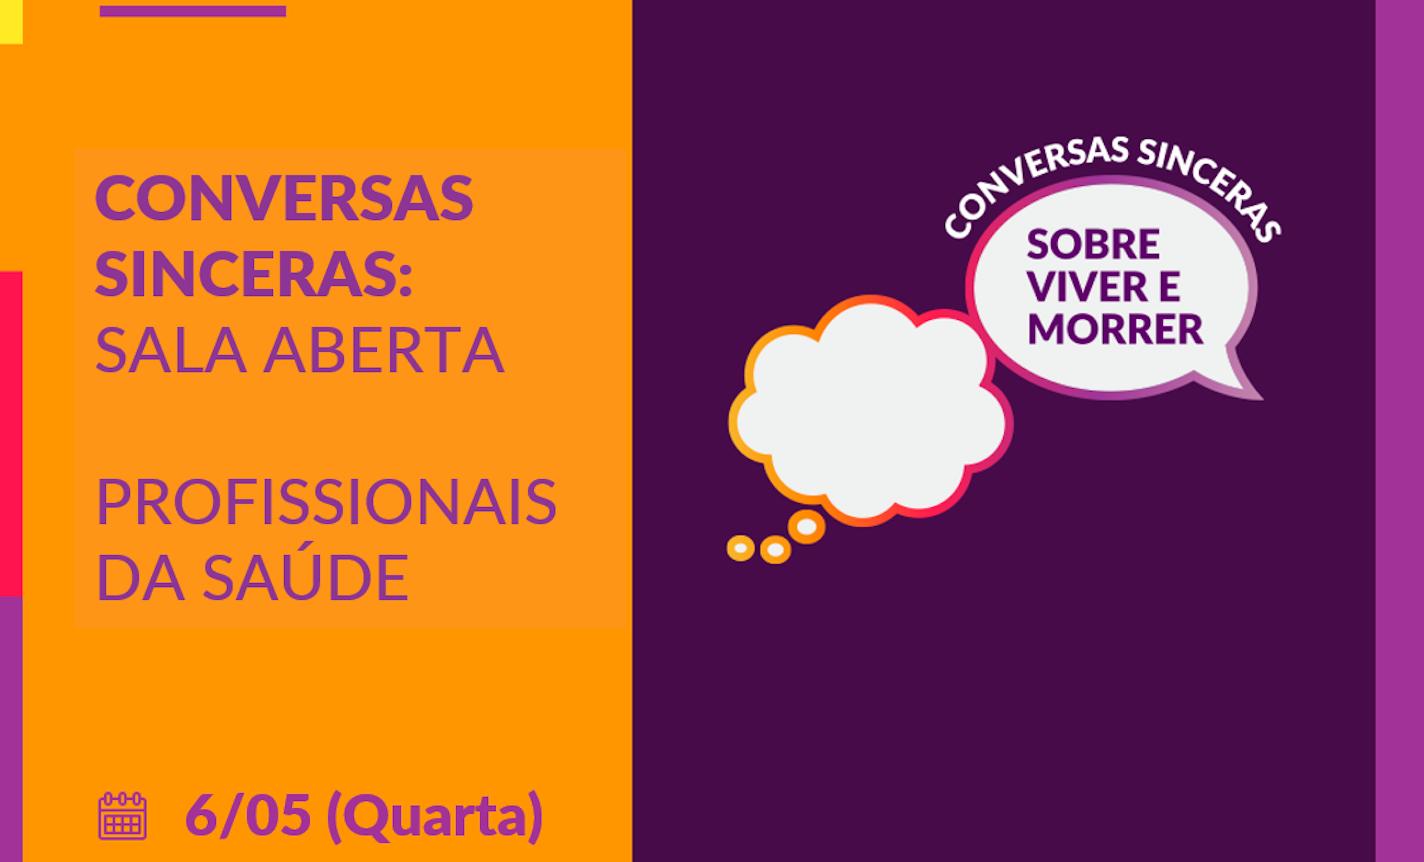 Sarau inFINITO | Conversas Sinceras - content in portuguese